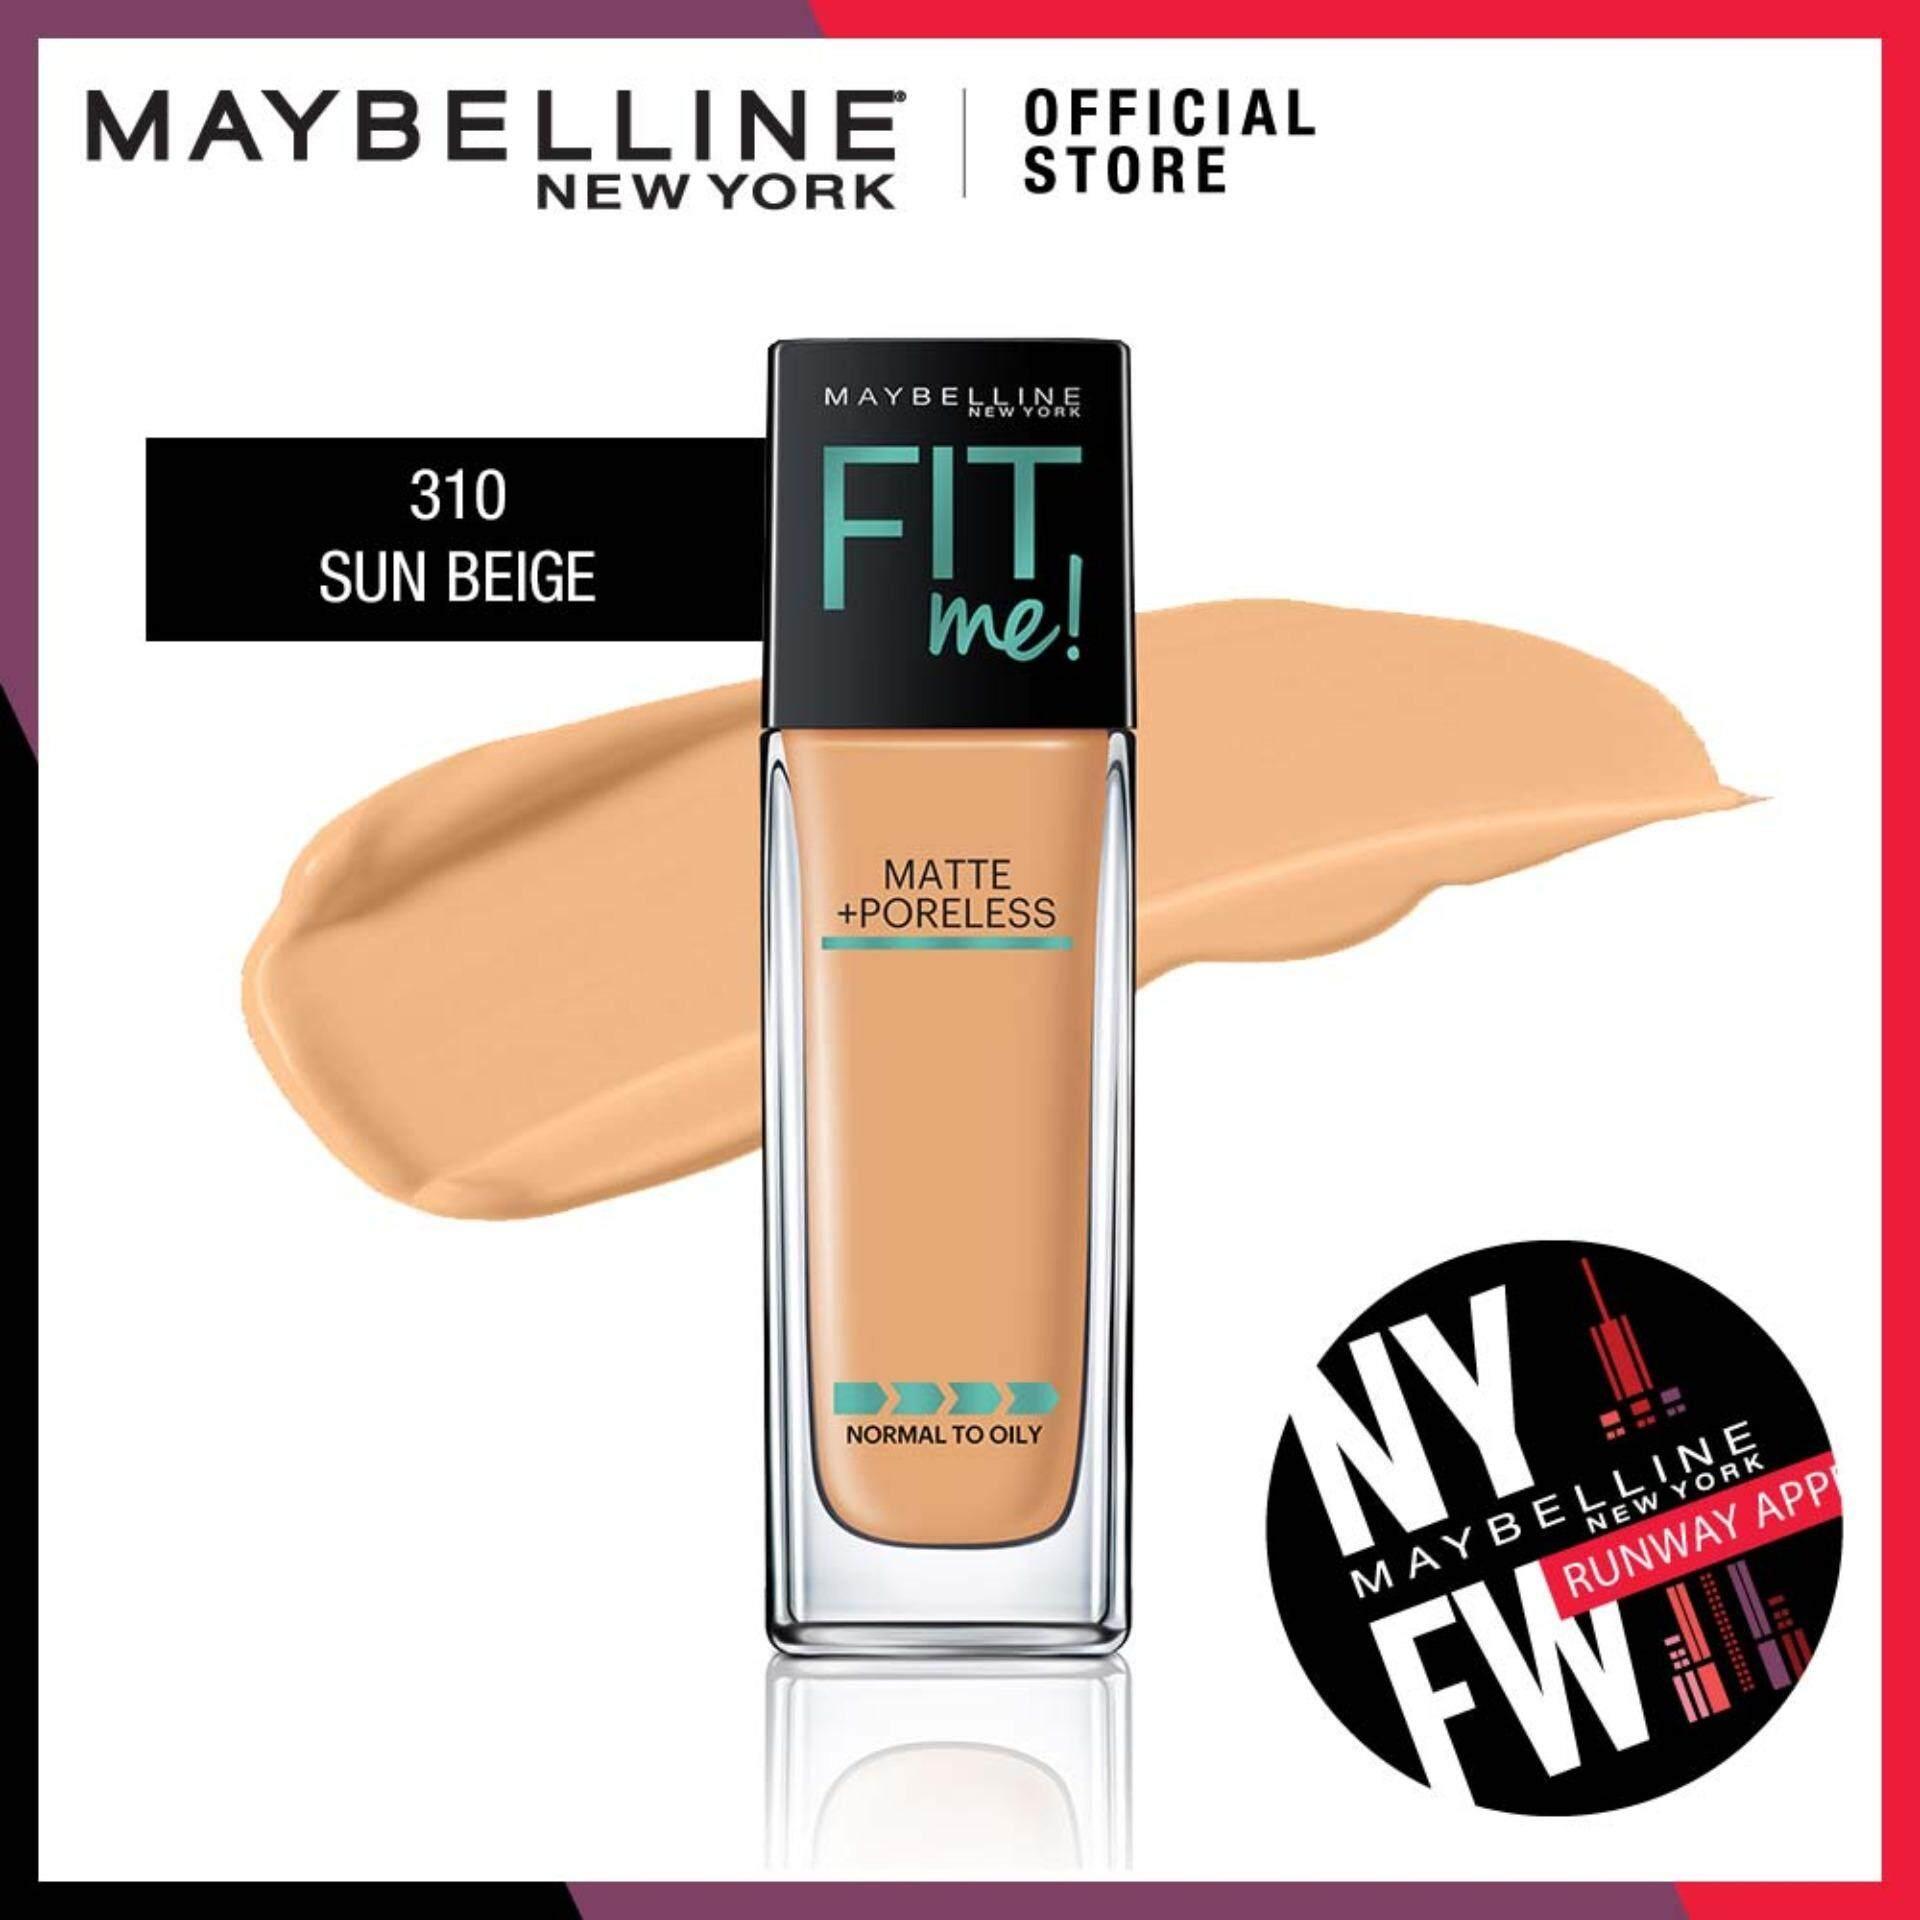 Fitur Maybelline Fit Me Matte Poreless Liquid Foundation 228 Soft 30ml